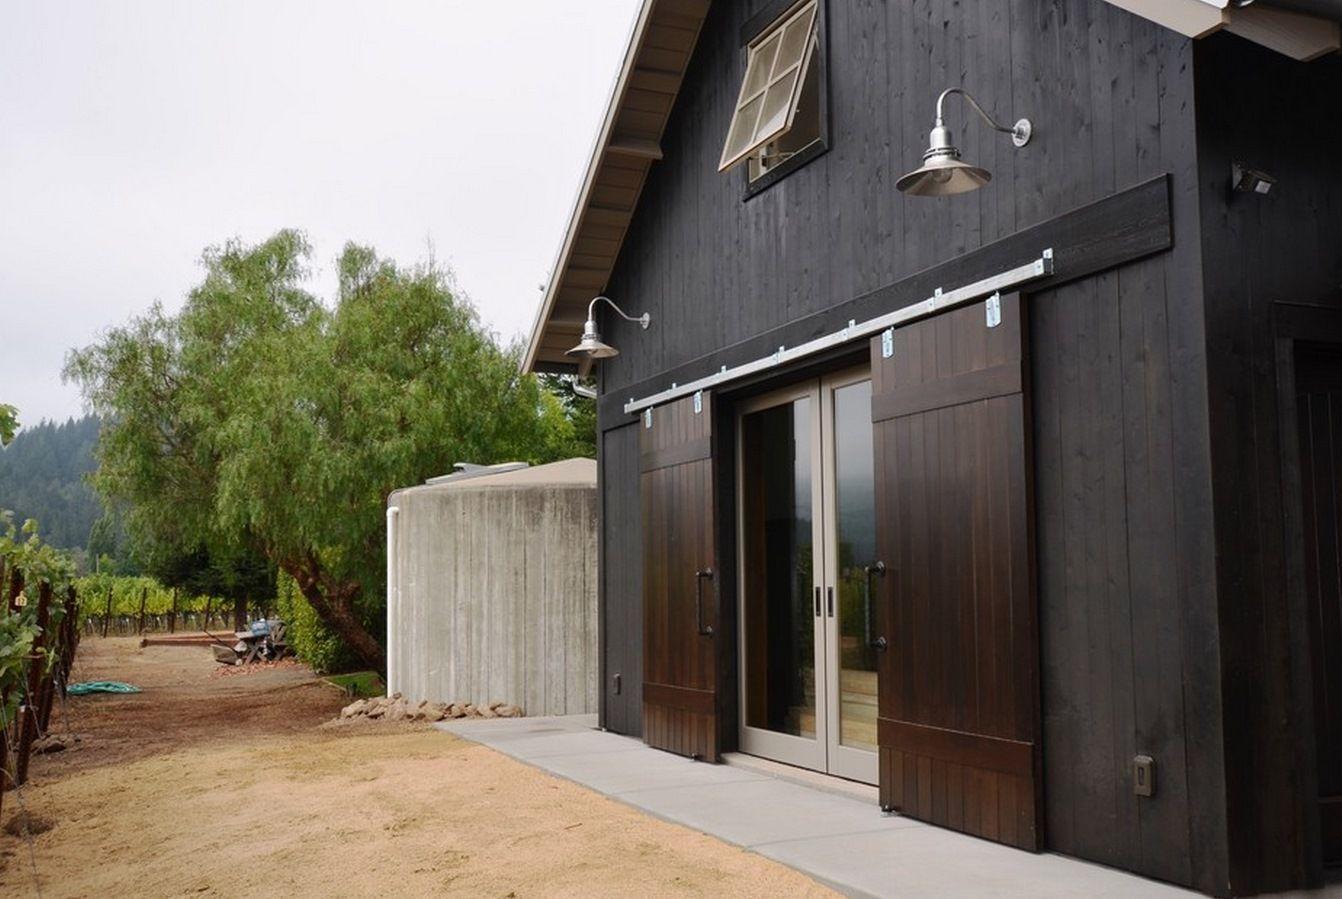 classic gooseneck barn lights for boutique california winery backyard exterior sliding barn. Black Bedroom Furniture Sets. Home Design Ideas